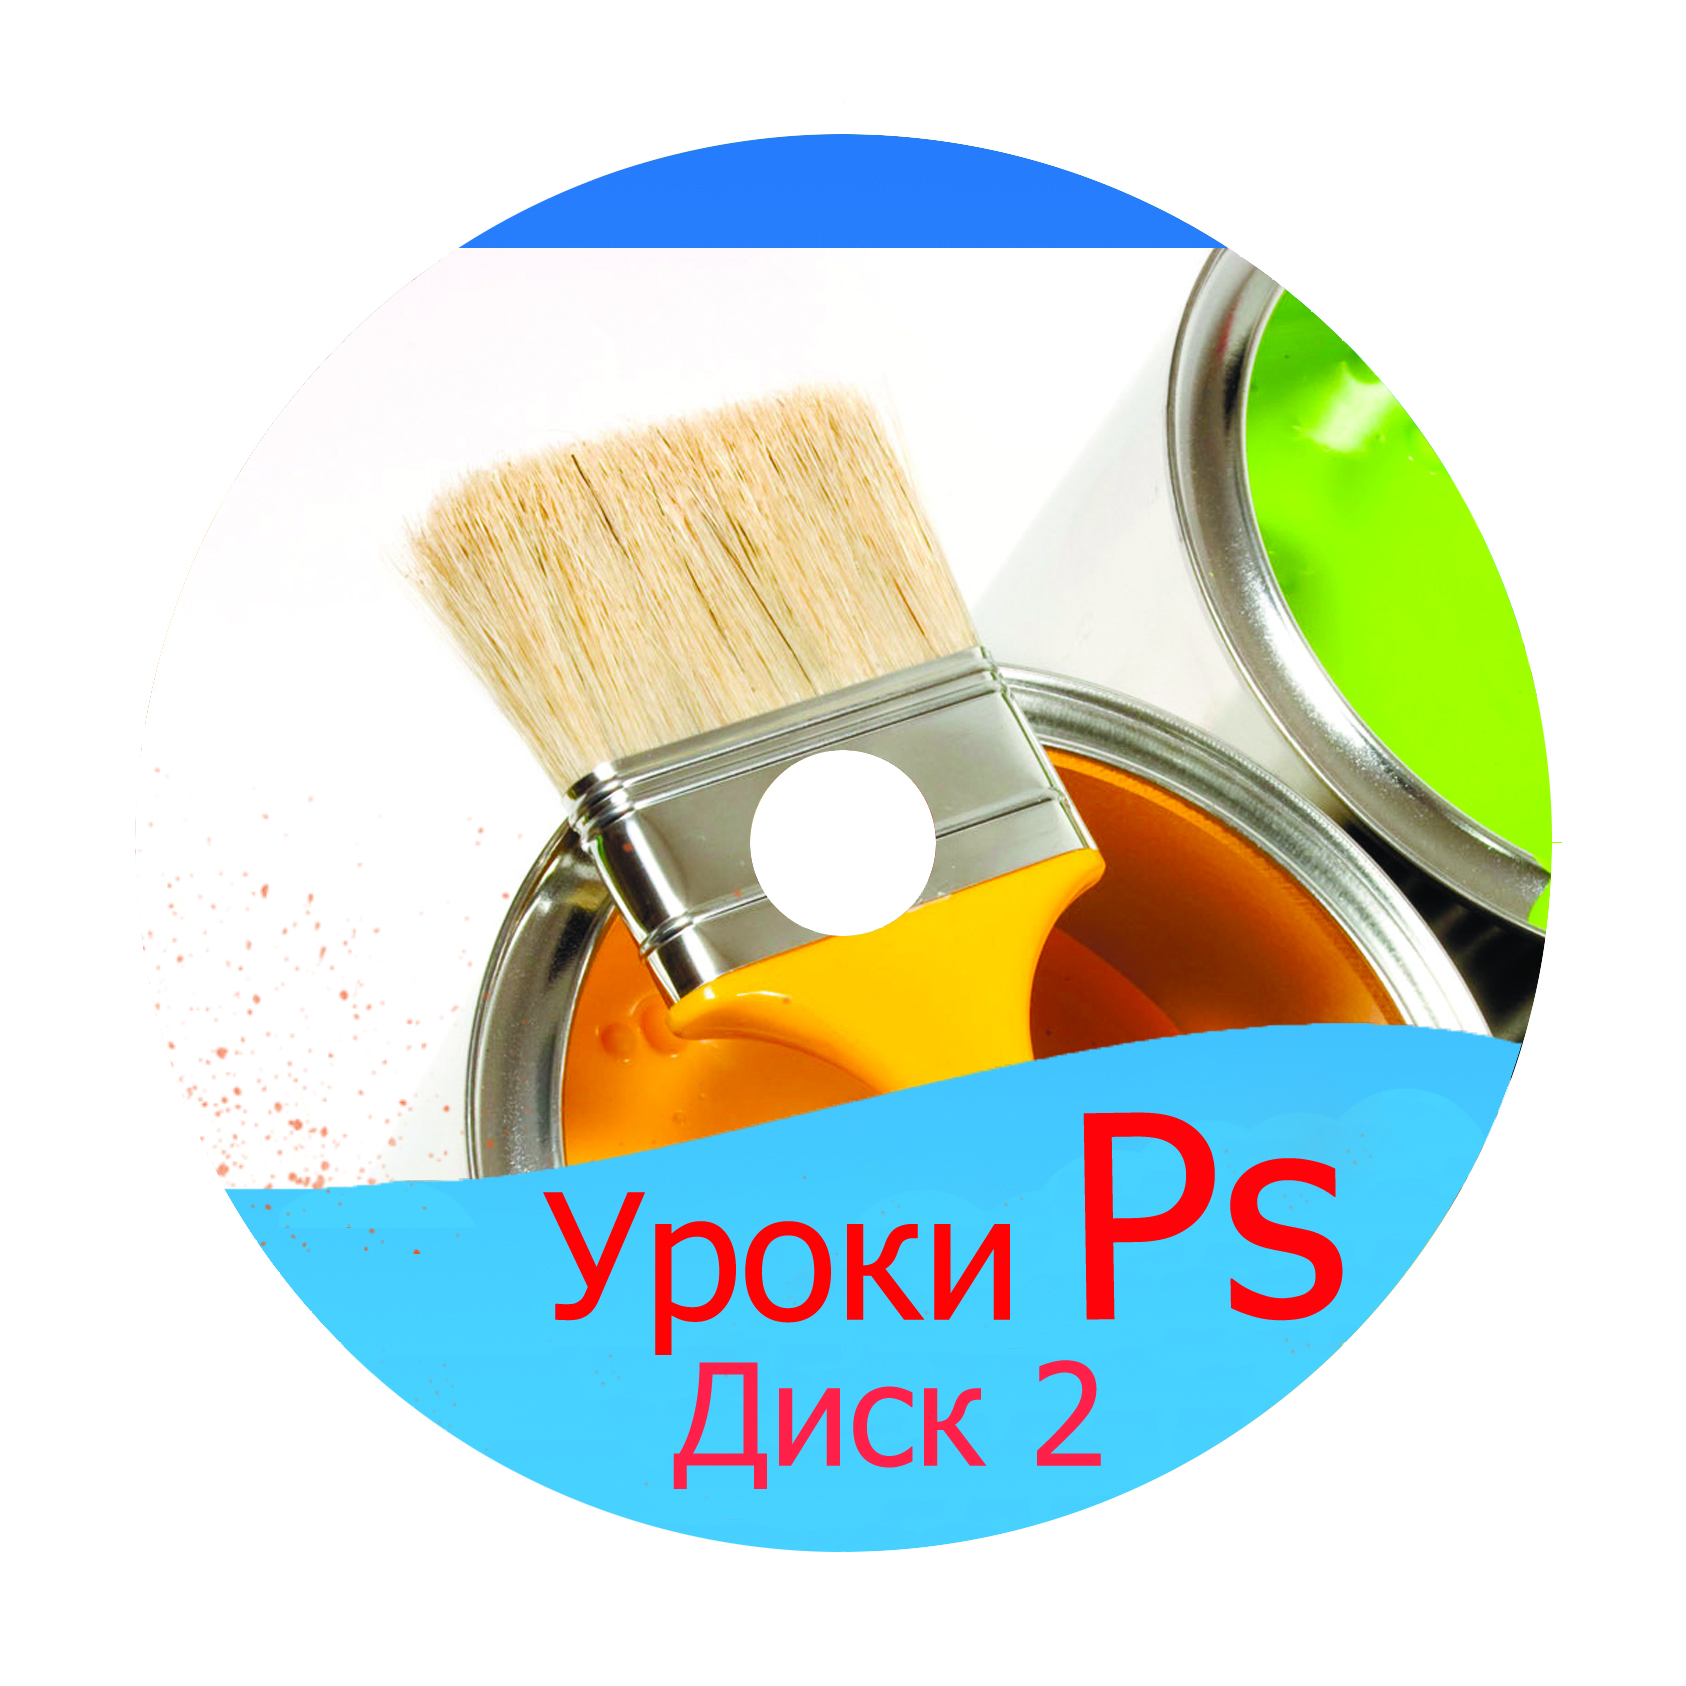 Создание дизайна DVD релиза (обложка, накатка, меню и т.п.) фото f_4d8c26e499f80.jpg